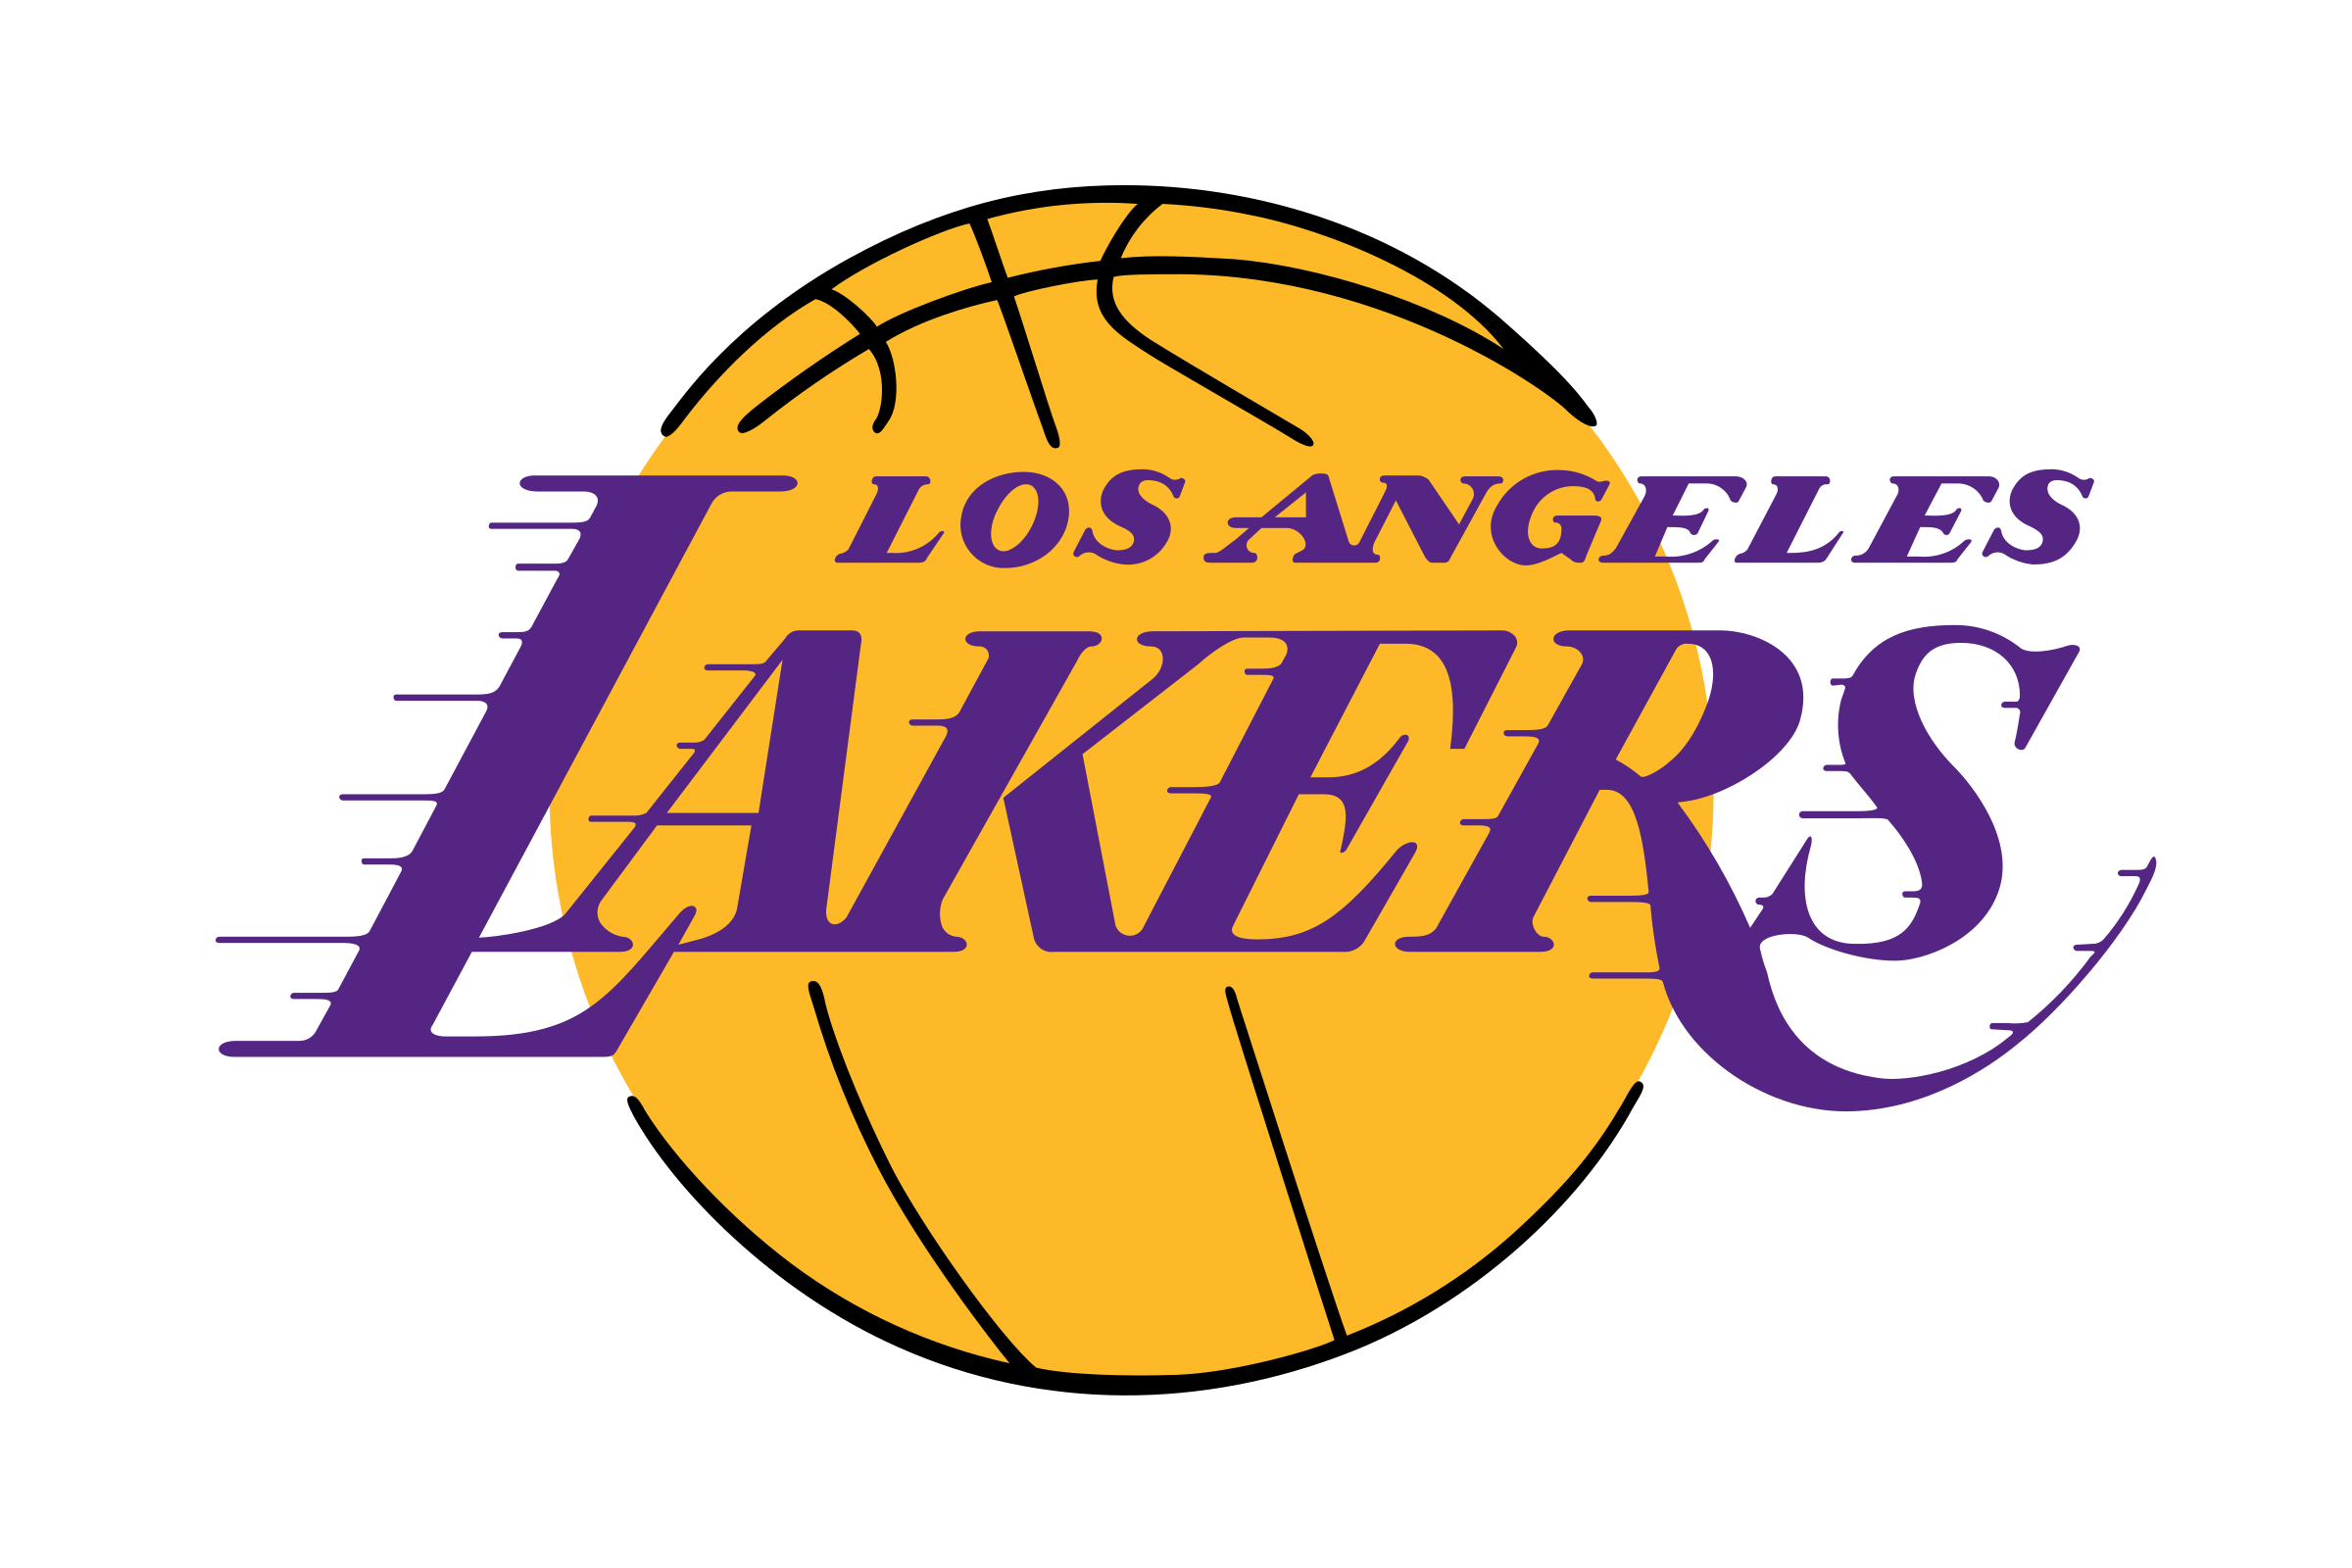 Los Angeles Laker - 81.64% GROWTH RATE - INSTAGRAM(vs. 36.68% VIA league average)